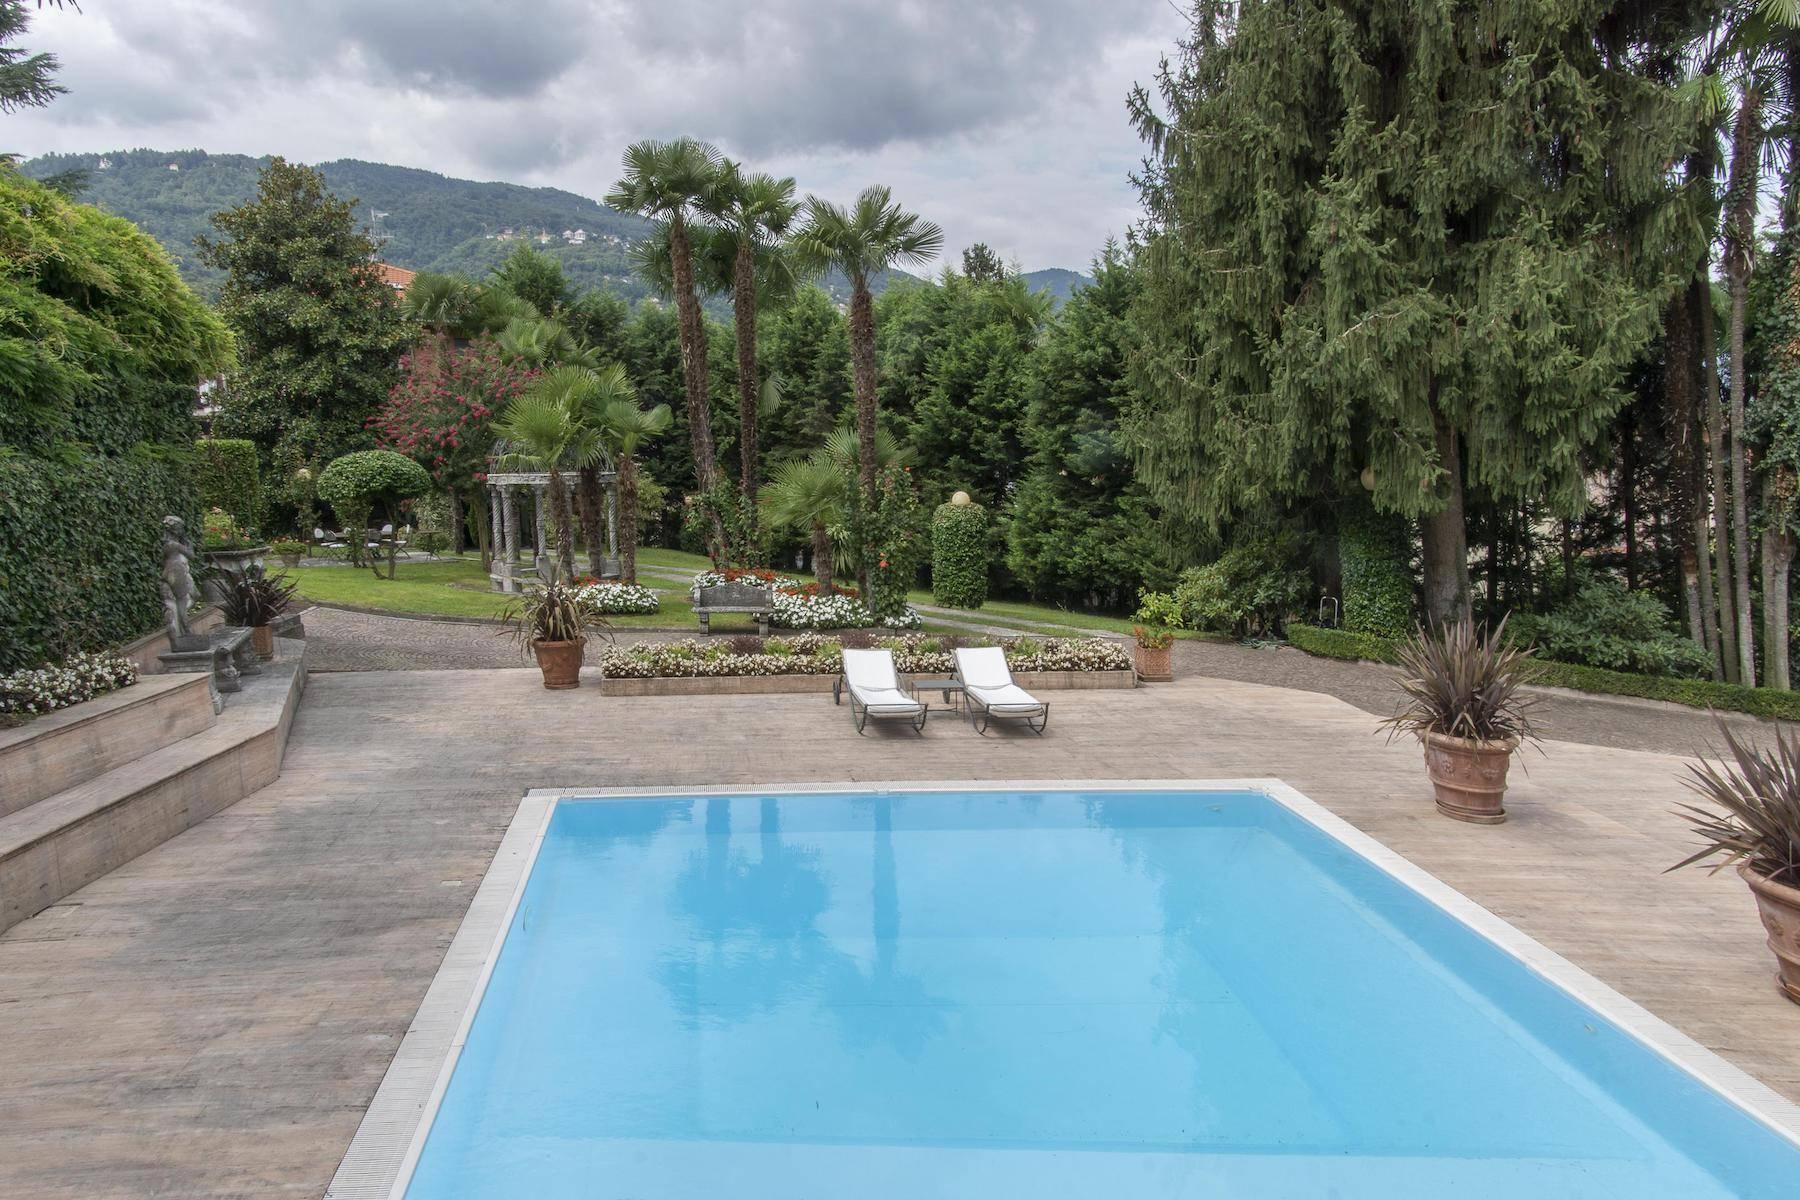 Villa in Vendita a Stresa: 5 locali, 700 mq - Foto 8